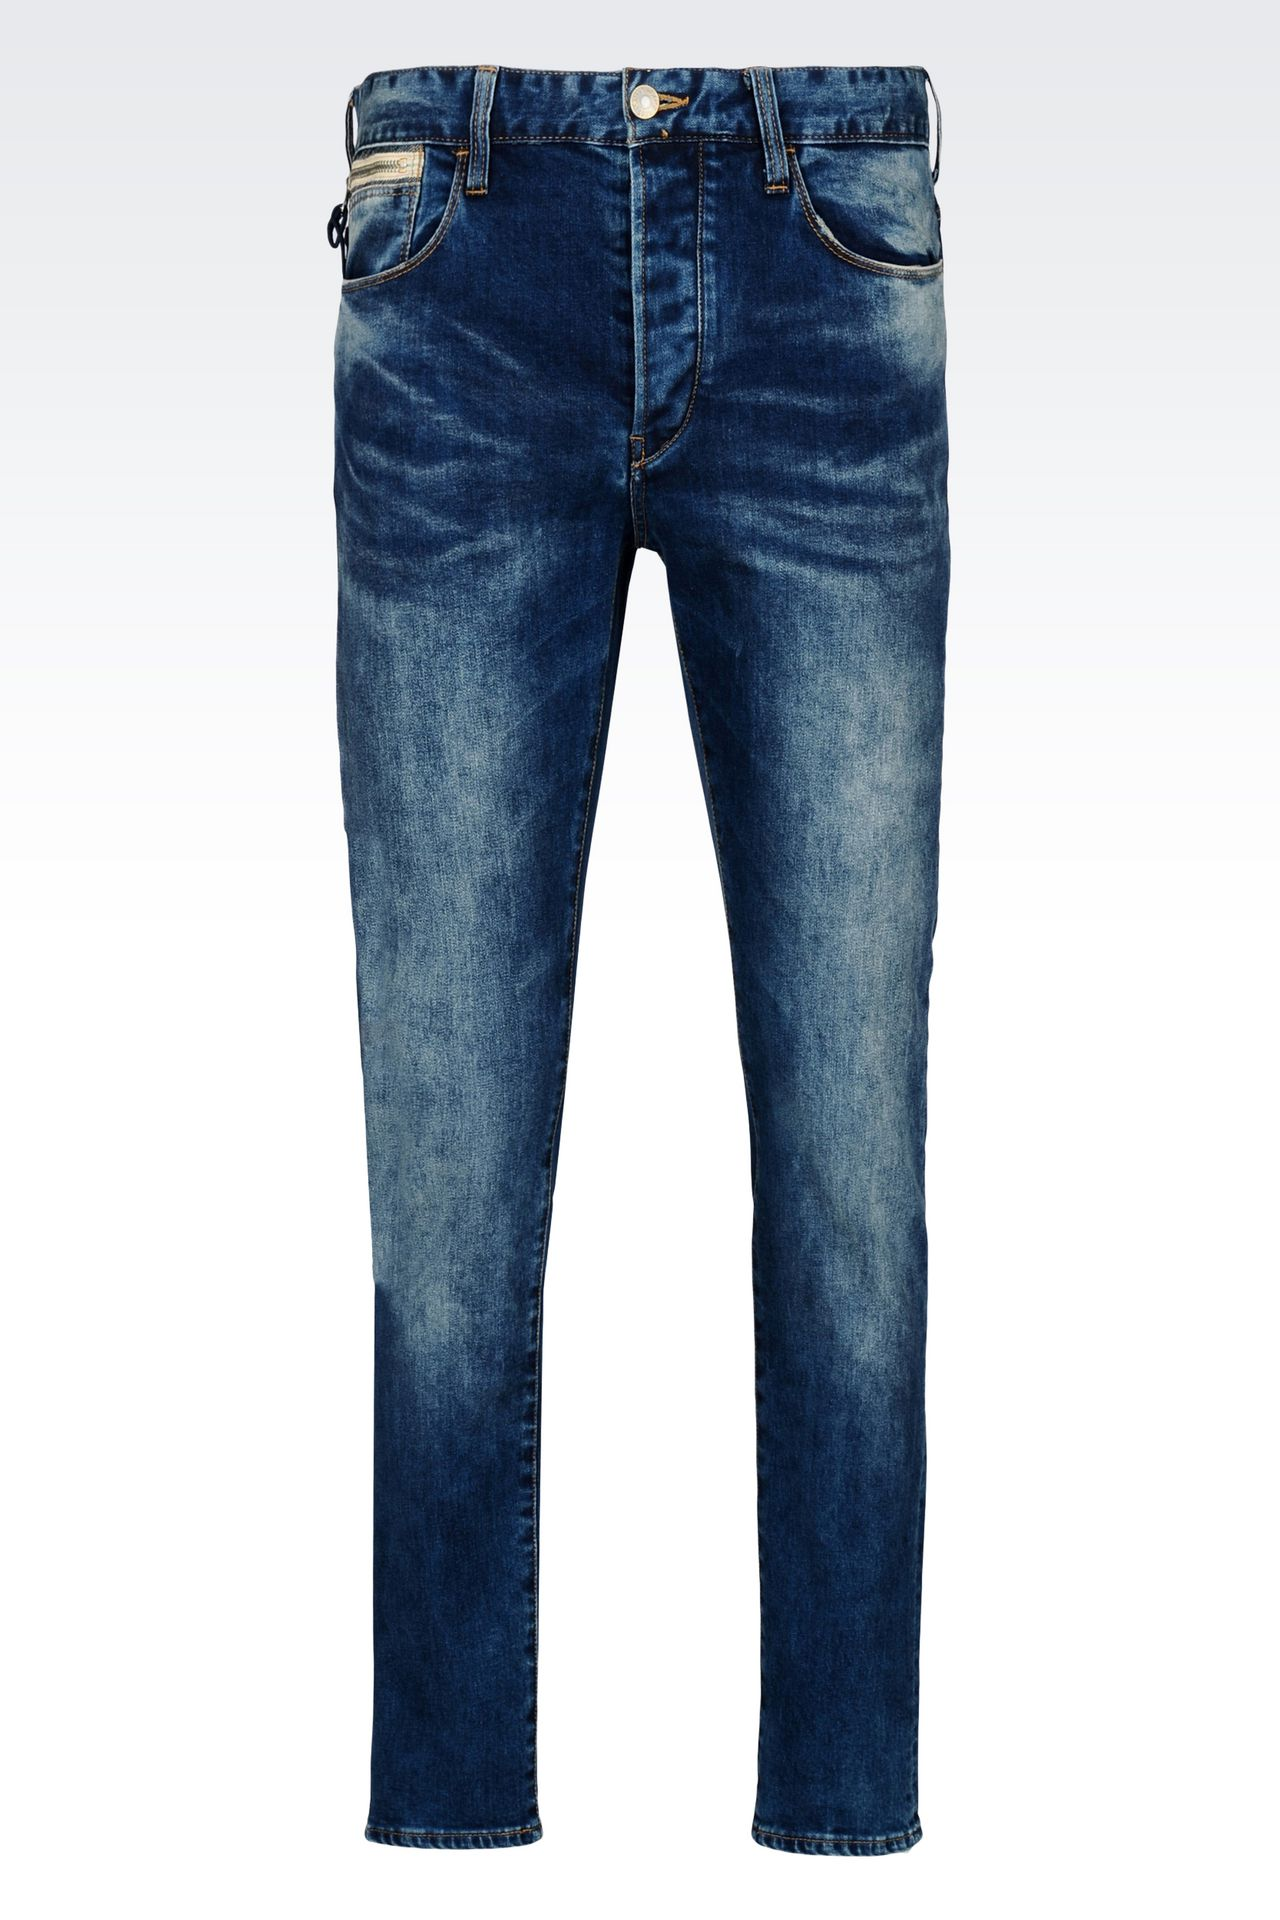 armani jeans men medium wash anti fit jeans. Black Bedroom Furniture Sets. Home Design Ideas